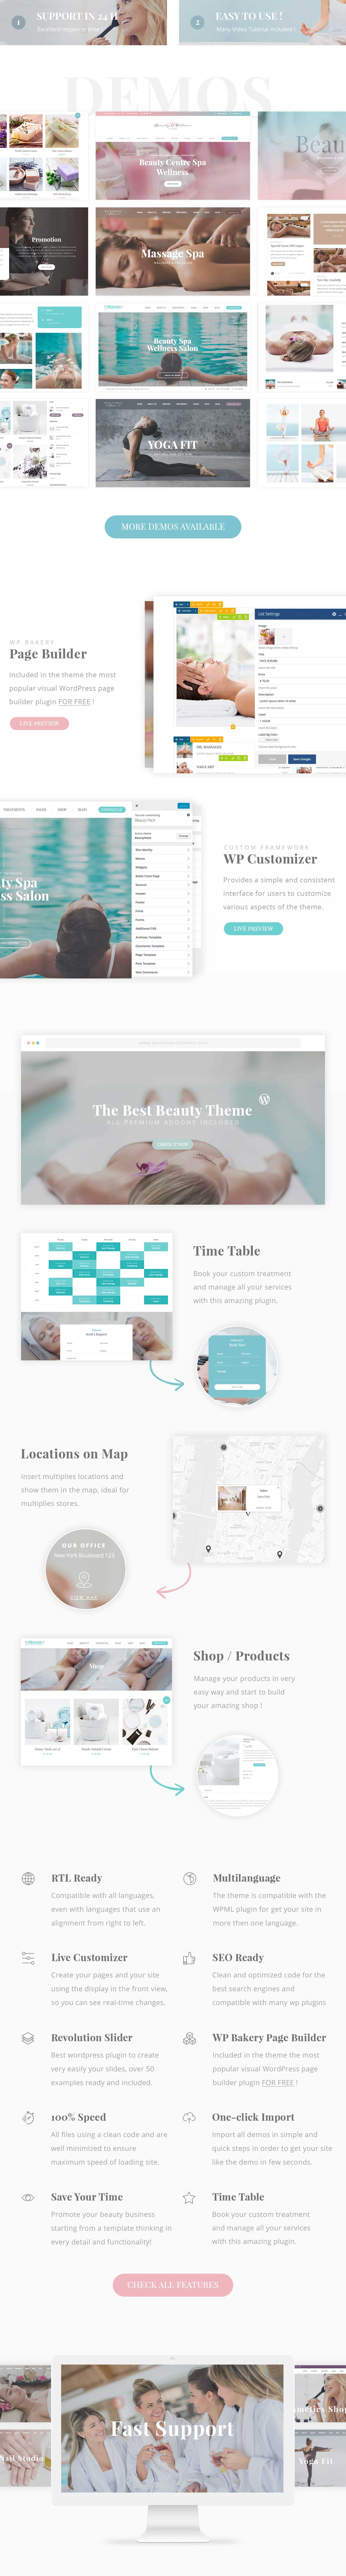 Beauty Pack - Wellness Spa & Beauty Massagesalons WP - 1